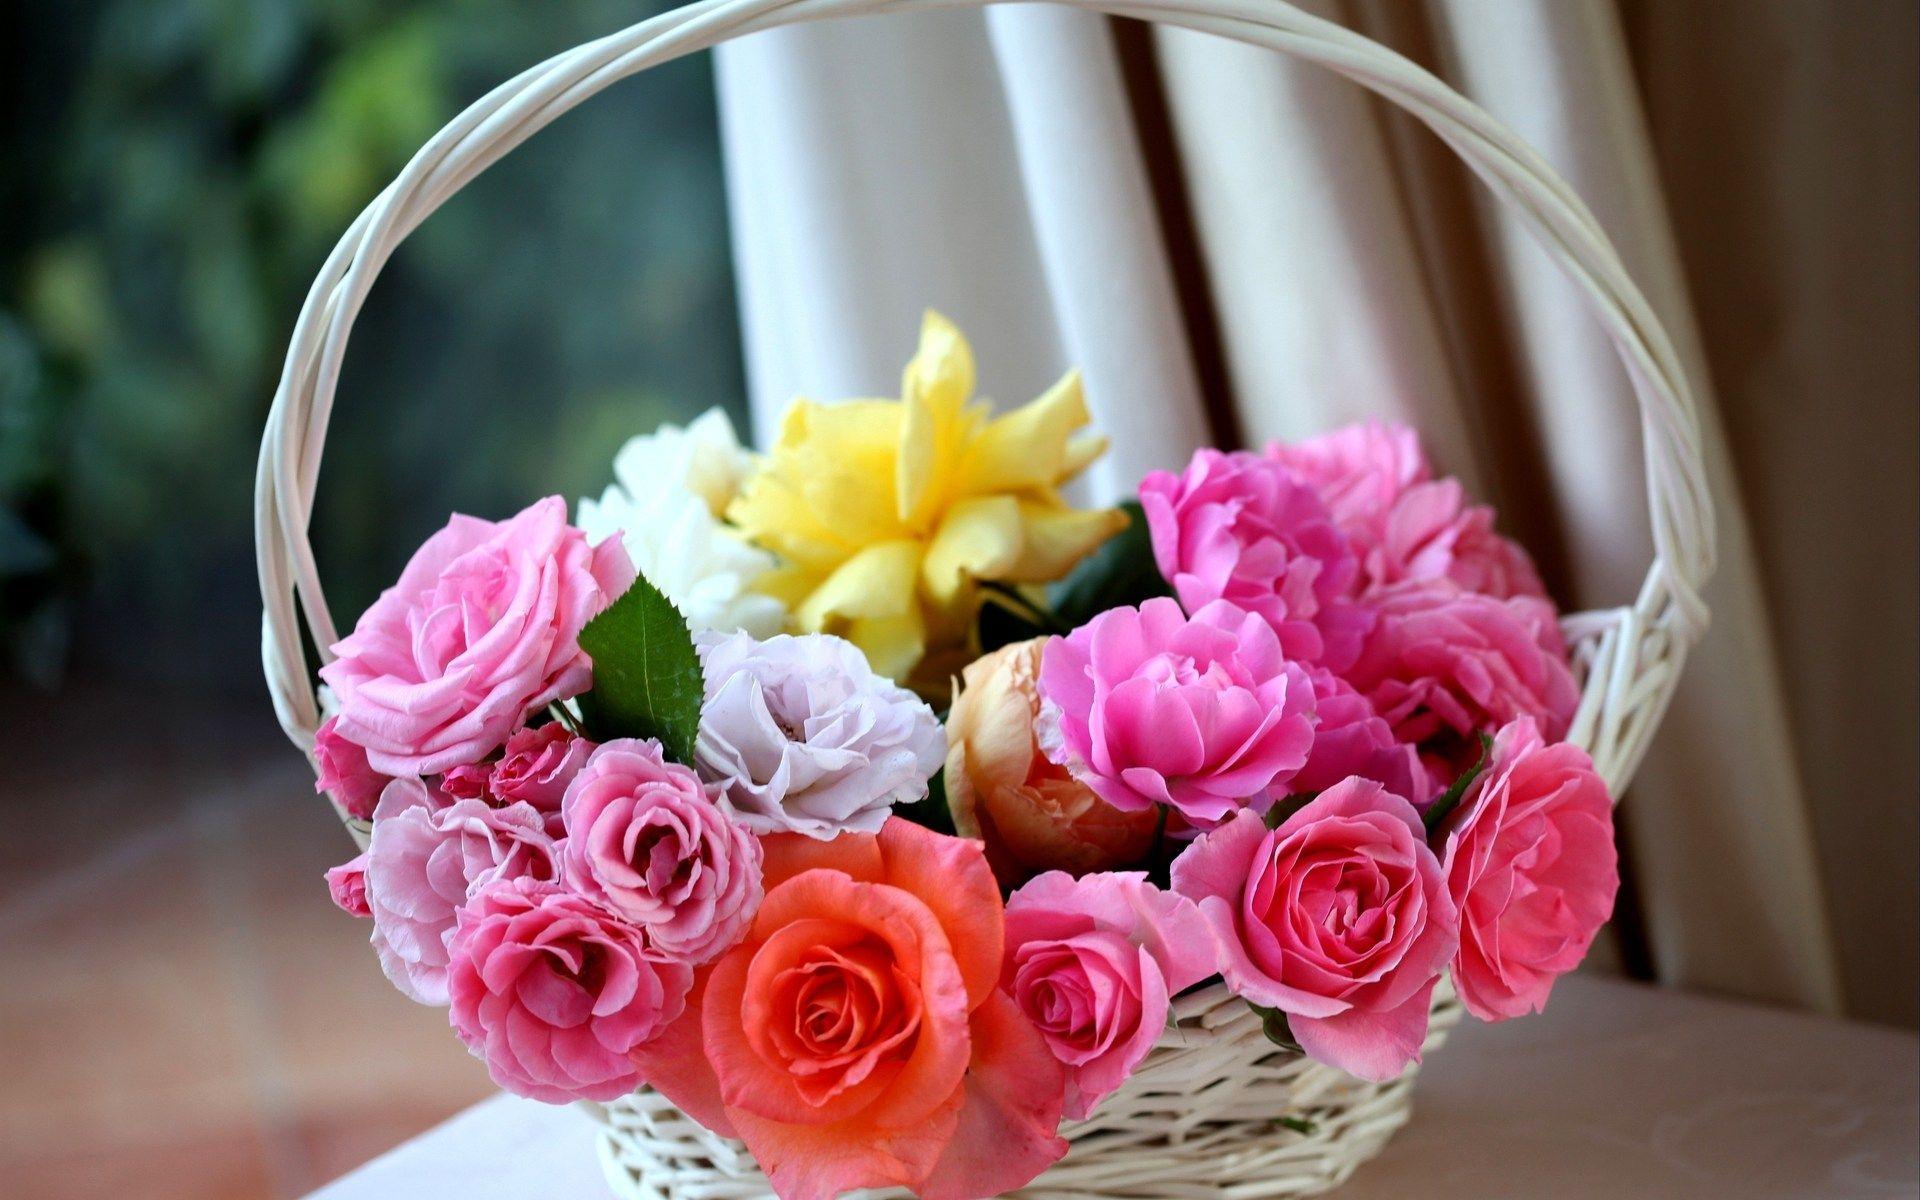 Beautiful Pink Rose Flower Arrangements Rose Flower Arrangements Beautiful Rose Flowers Pink Rose Flower